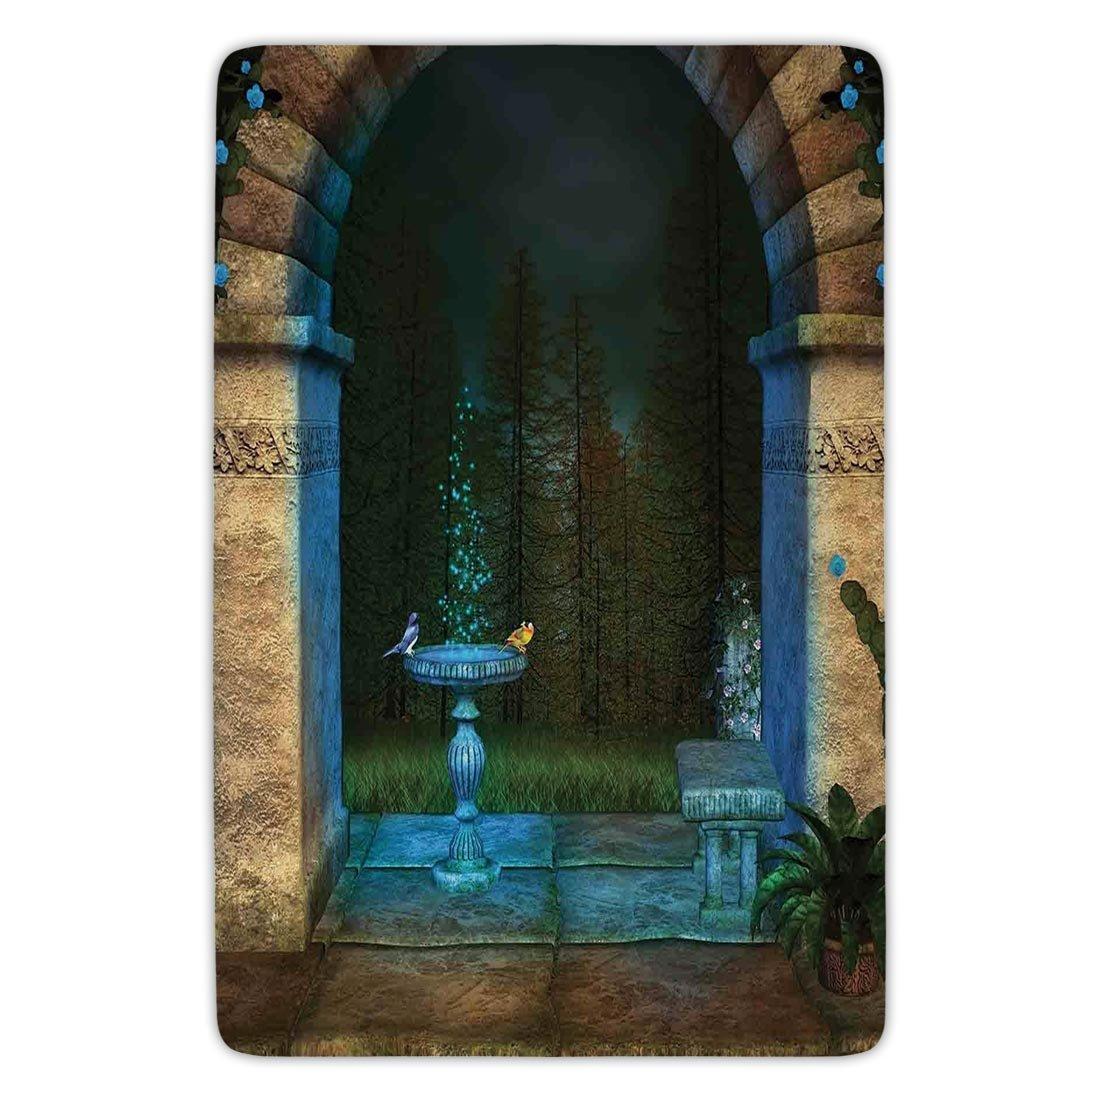 Bathroom Bath Rug Kitchen Floor Mat Carpet,Gothic,Forest Landscape from Ancient Archway Birds on Fountain Fairytale Illustration,Blue Grey Green,Flannel Microfiber Non-slip Soft Absorbent